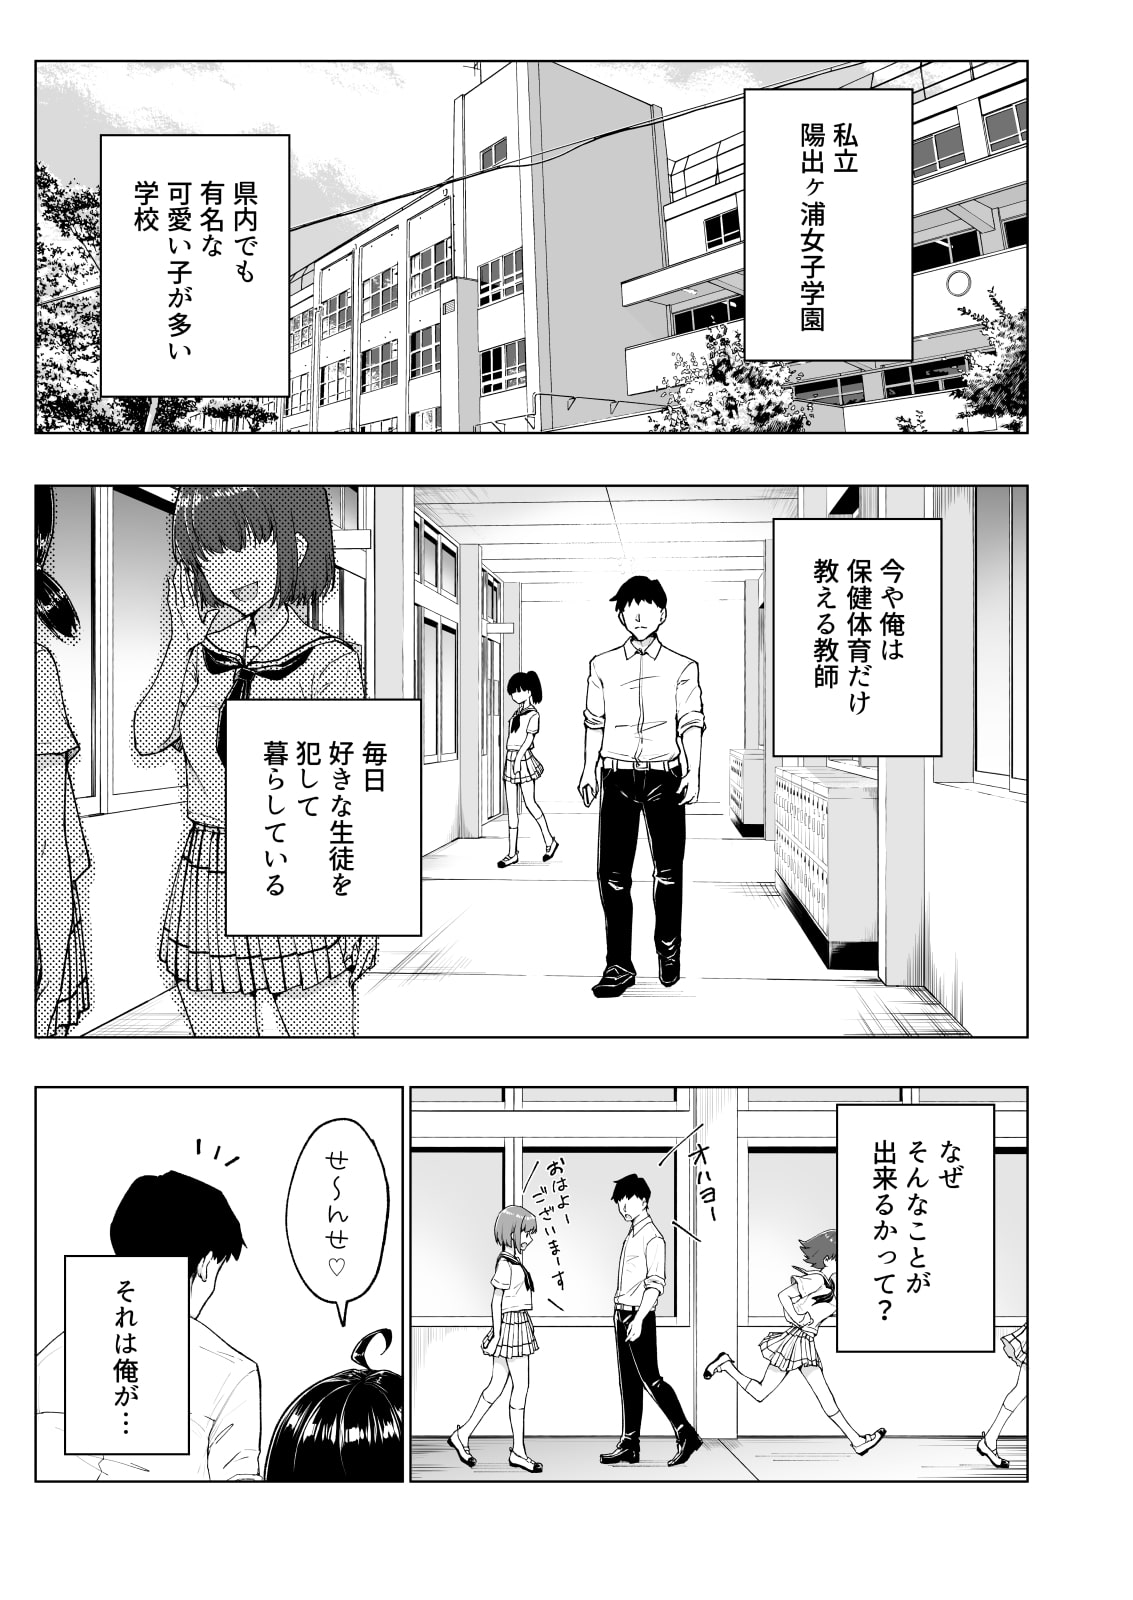 RJ316880 セックススマートフォン~ハーレム学園総集編~ [20210213]